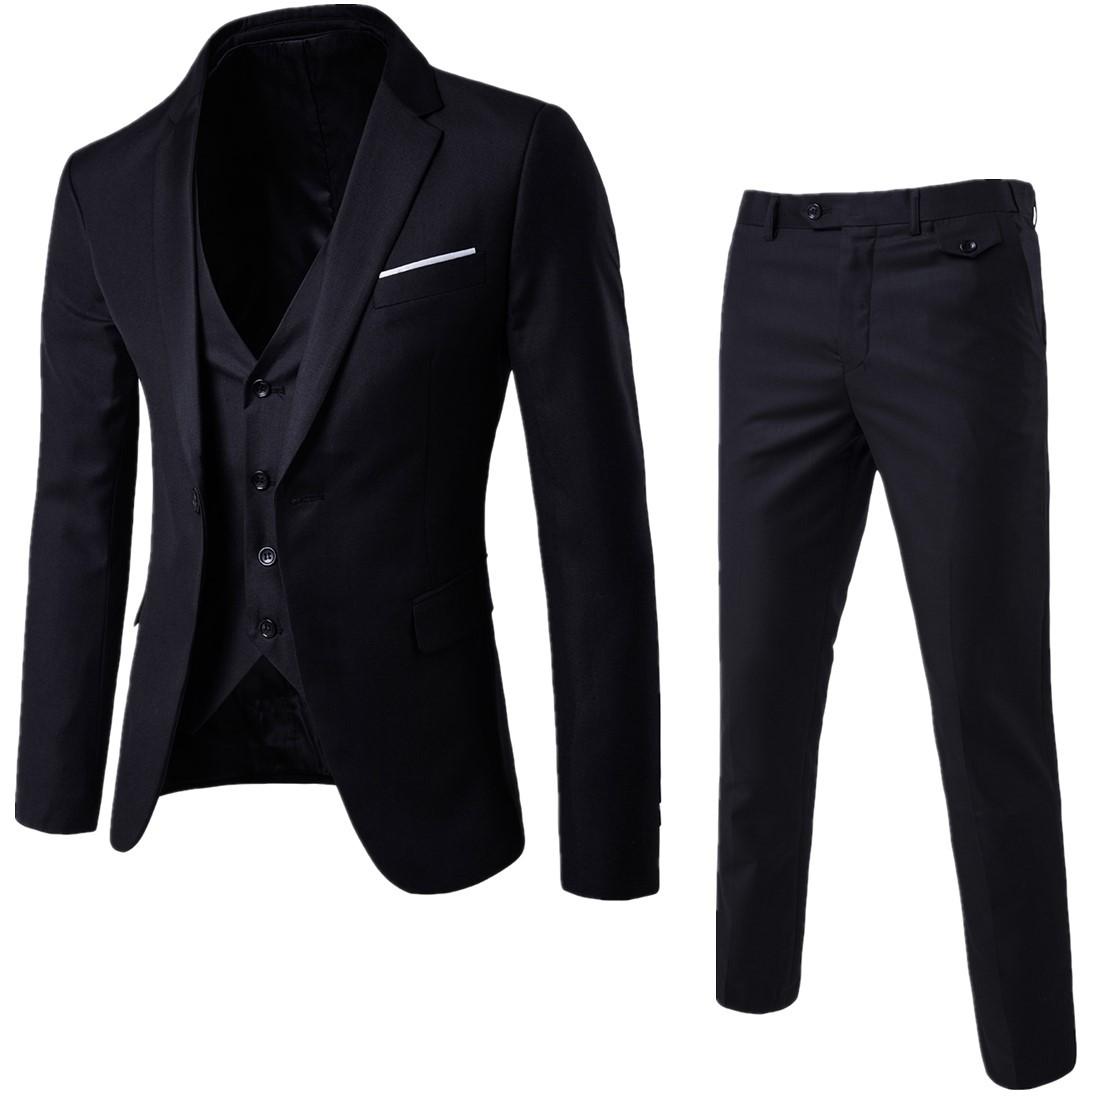 MEN'S Suit Set Three-piece Set Business Formal Wear Men's Interview Gentleman Korean-style Slim Fit Students Suit Wedding